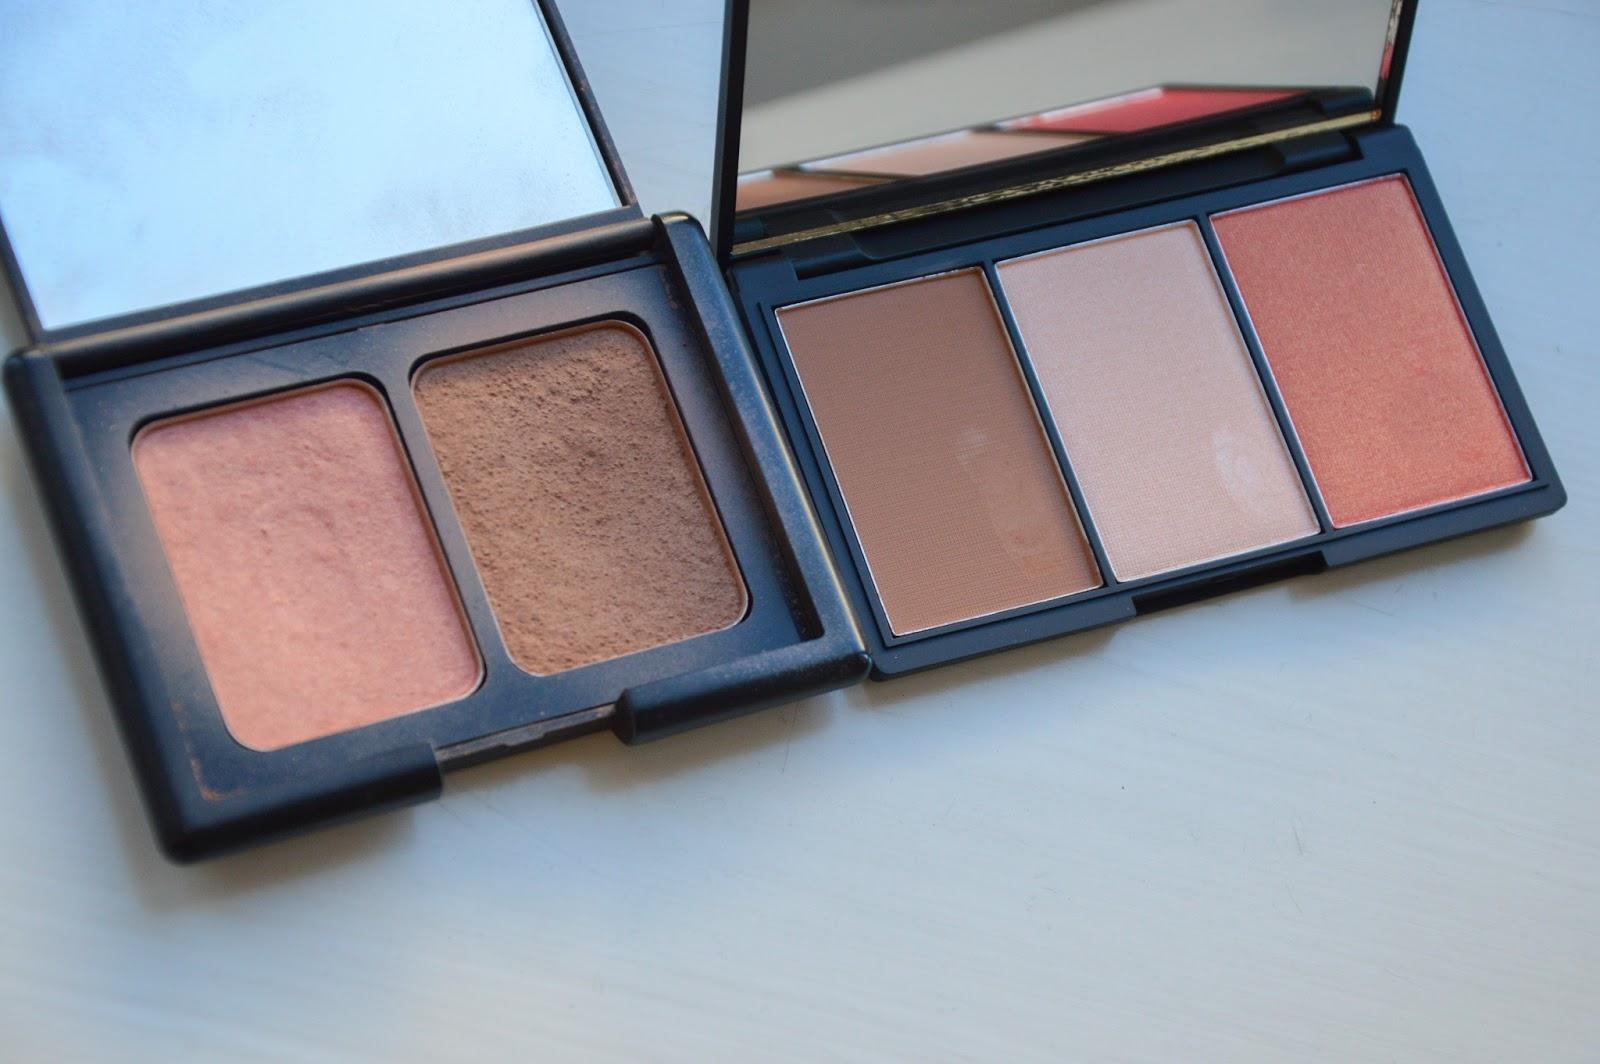 noiamnotaladyboy: Product Review: Sleek Makeup Face Form & iDivine ...